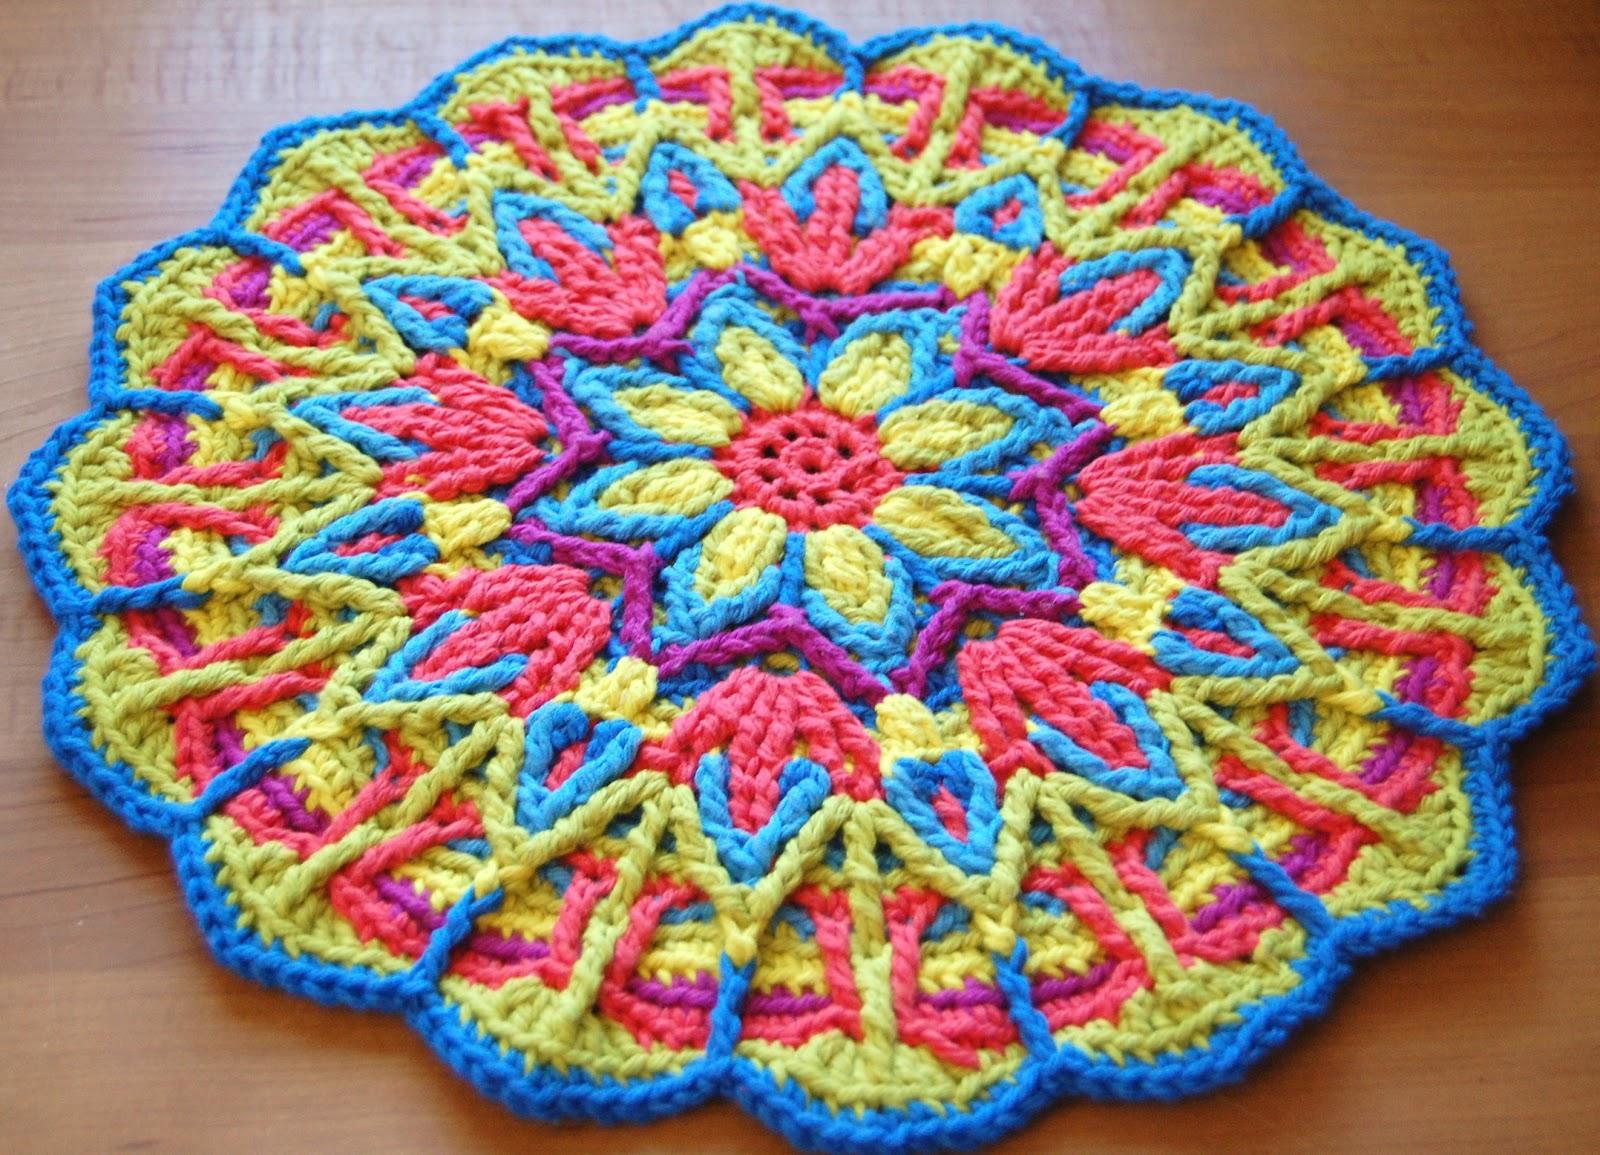 Overlay Crochet Mandala CAL - Petals to Picots